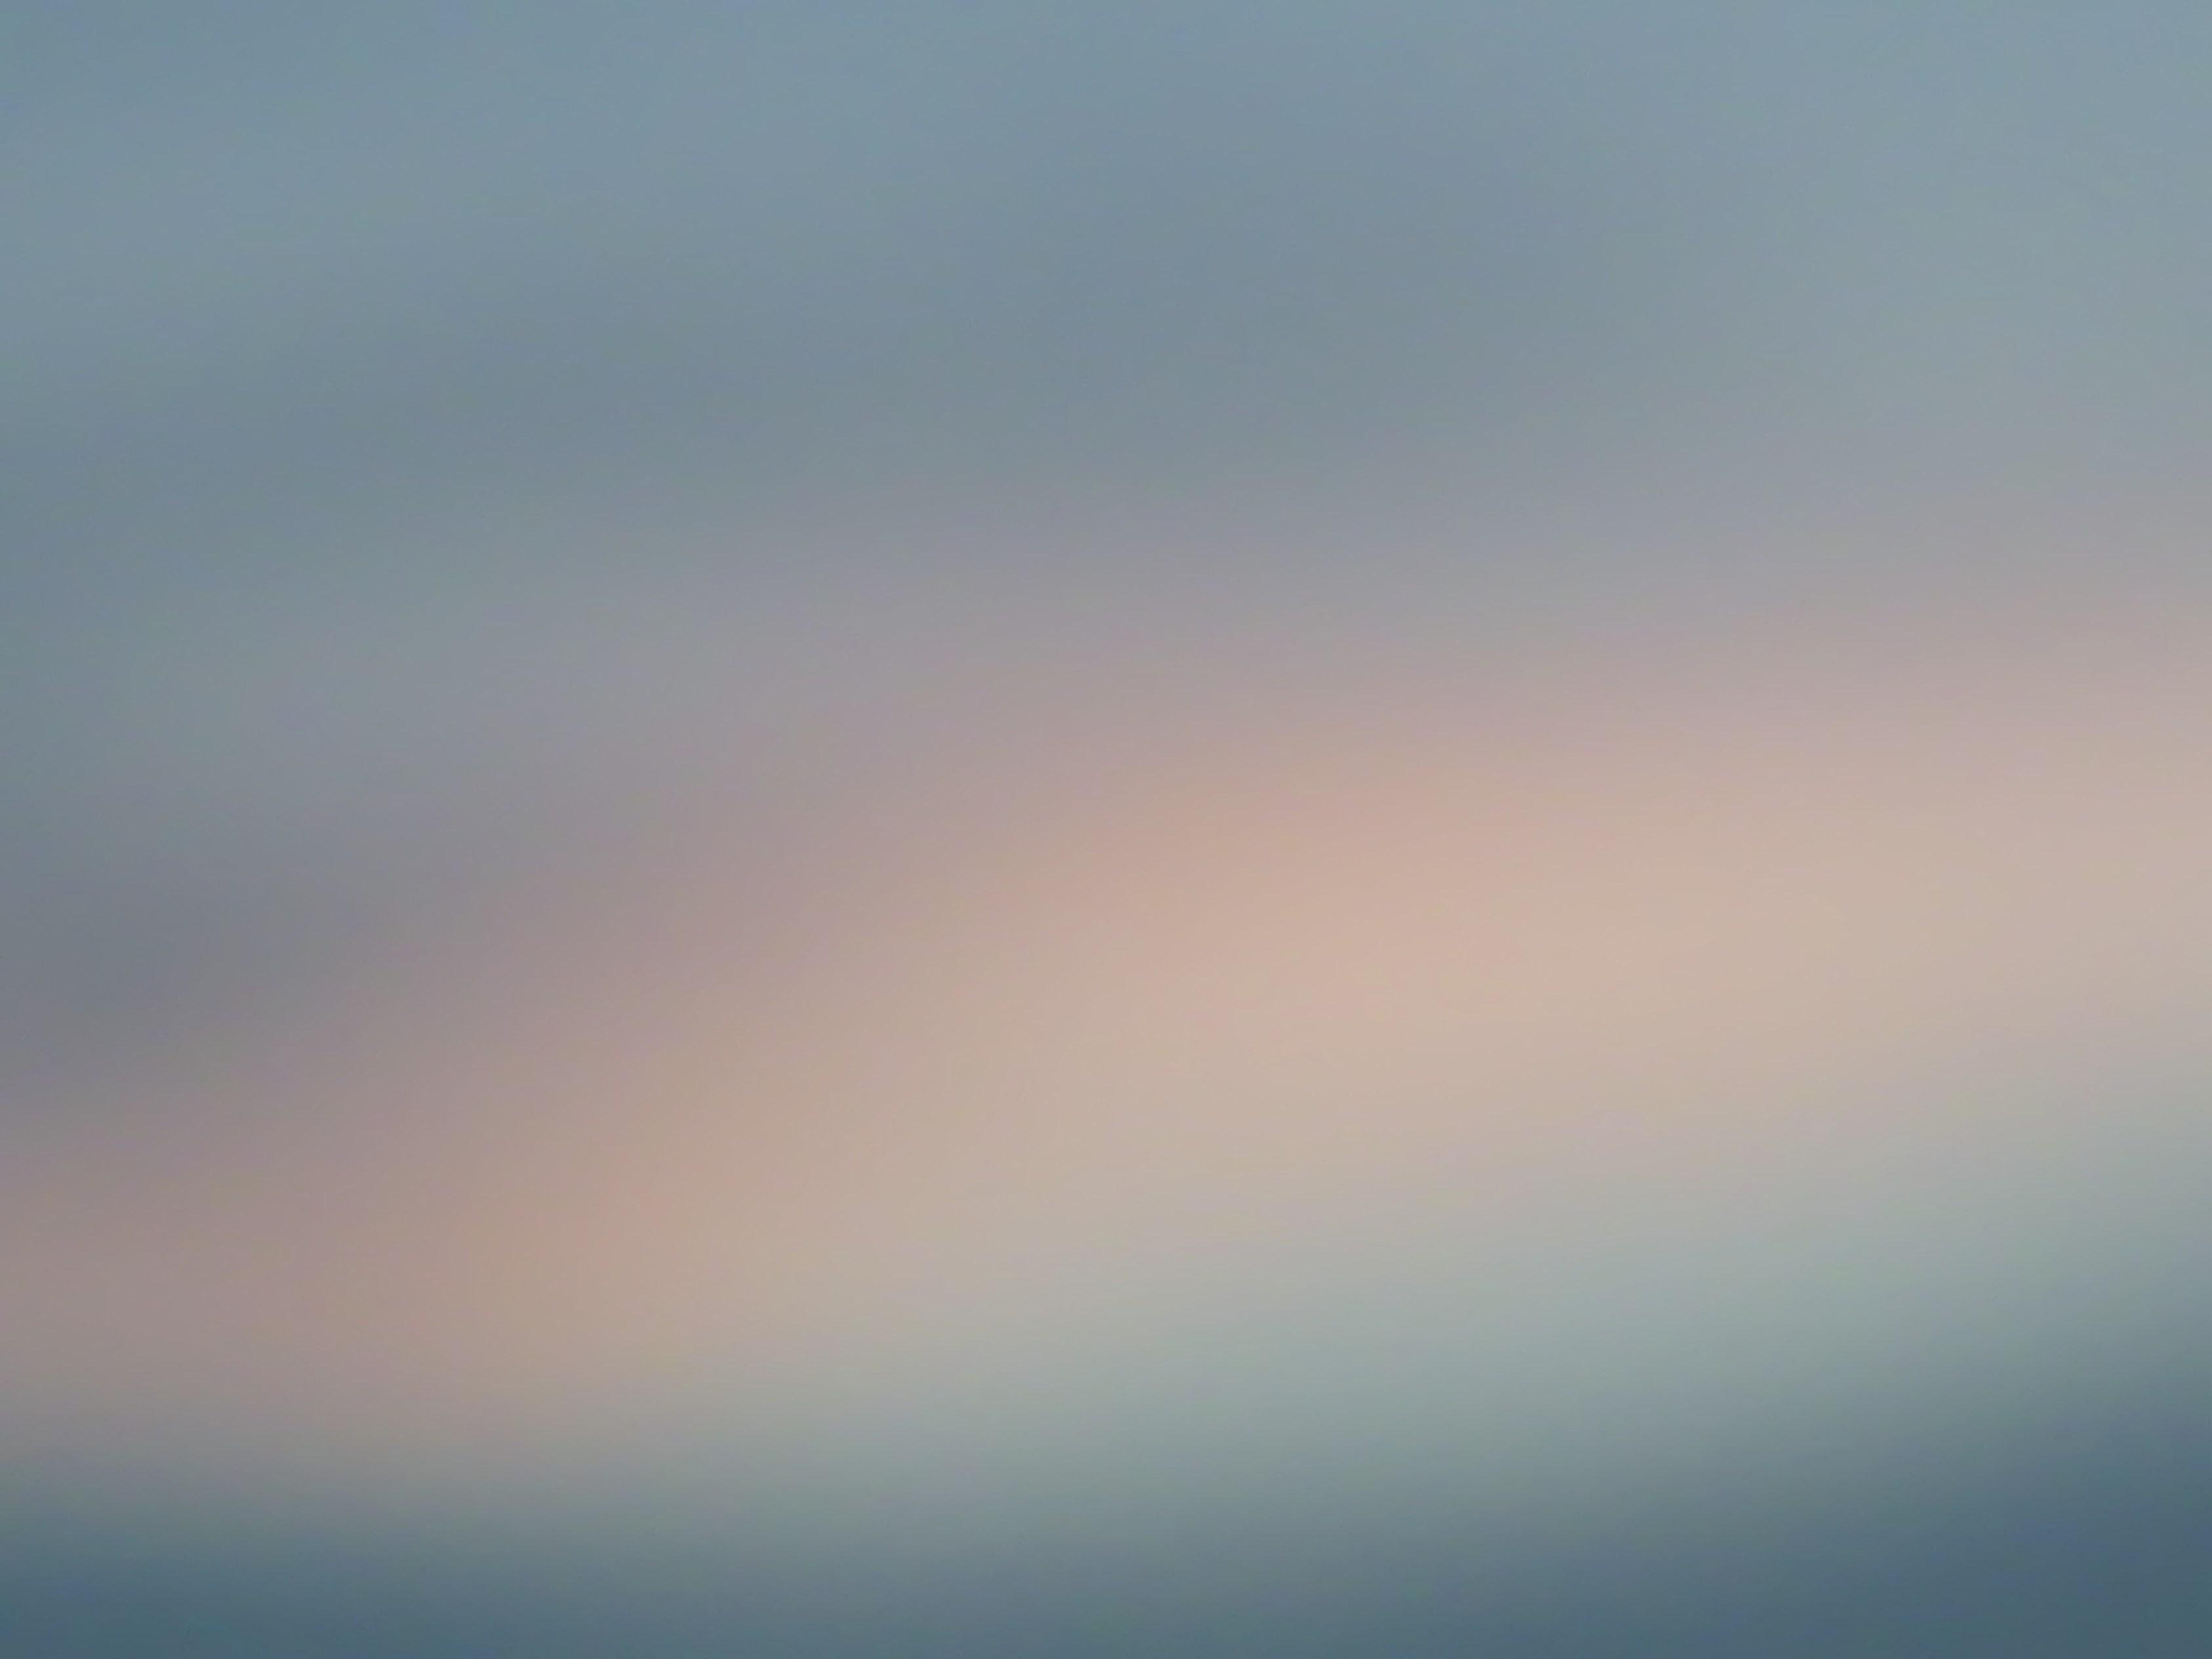 free blurred backgrounds for your website or blog western slope